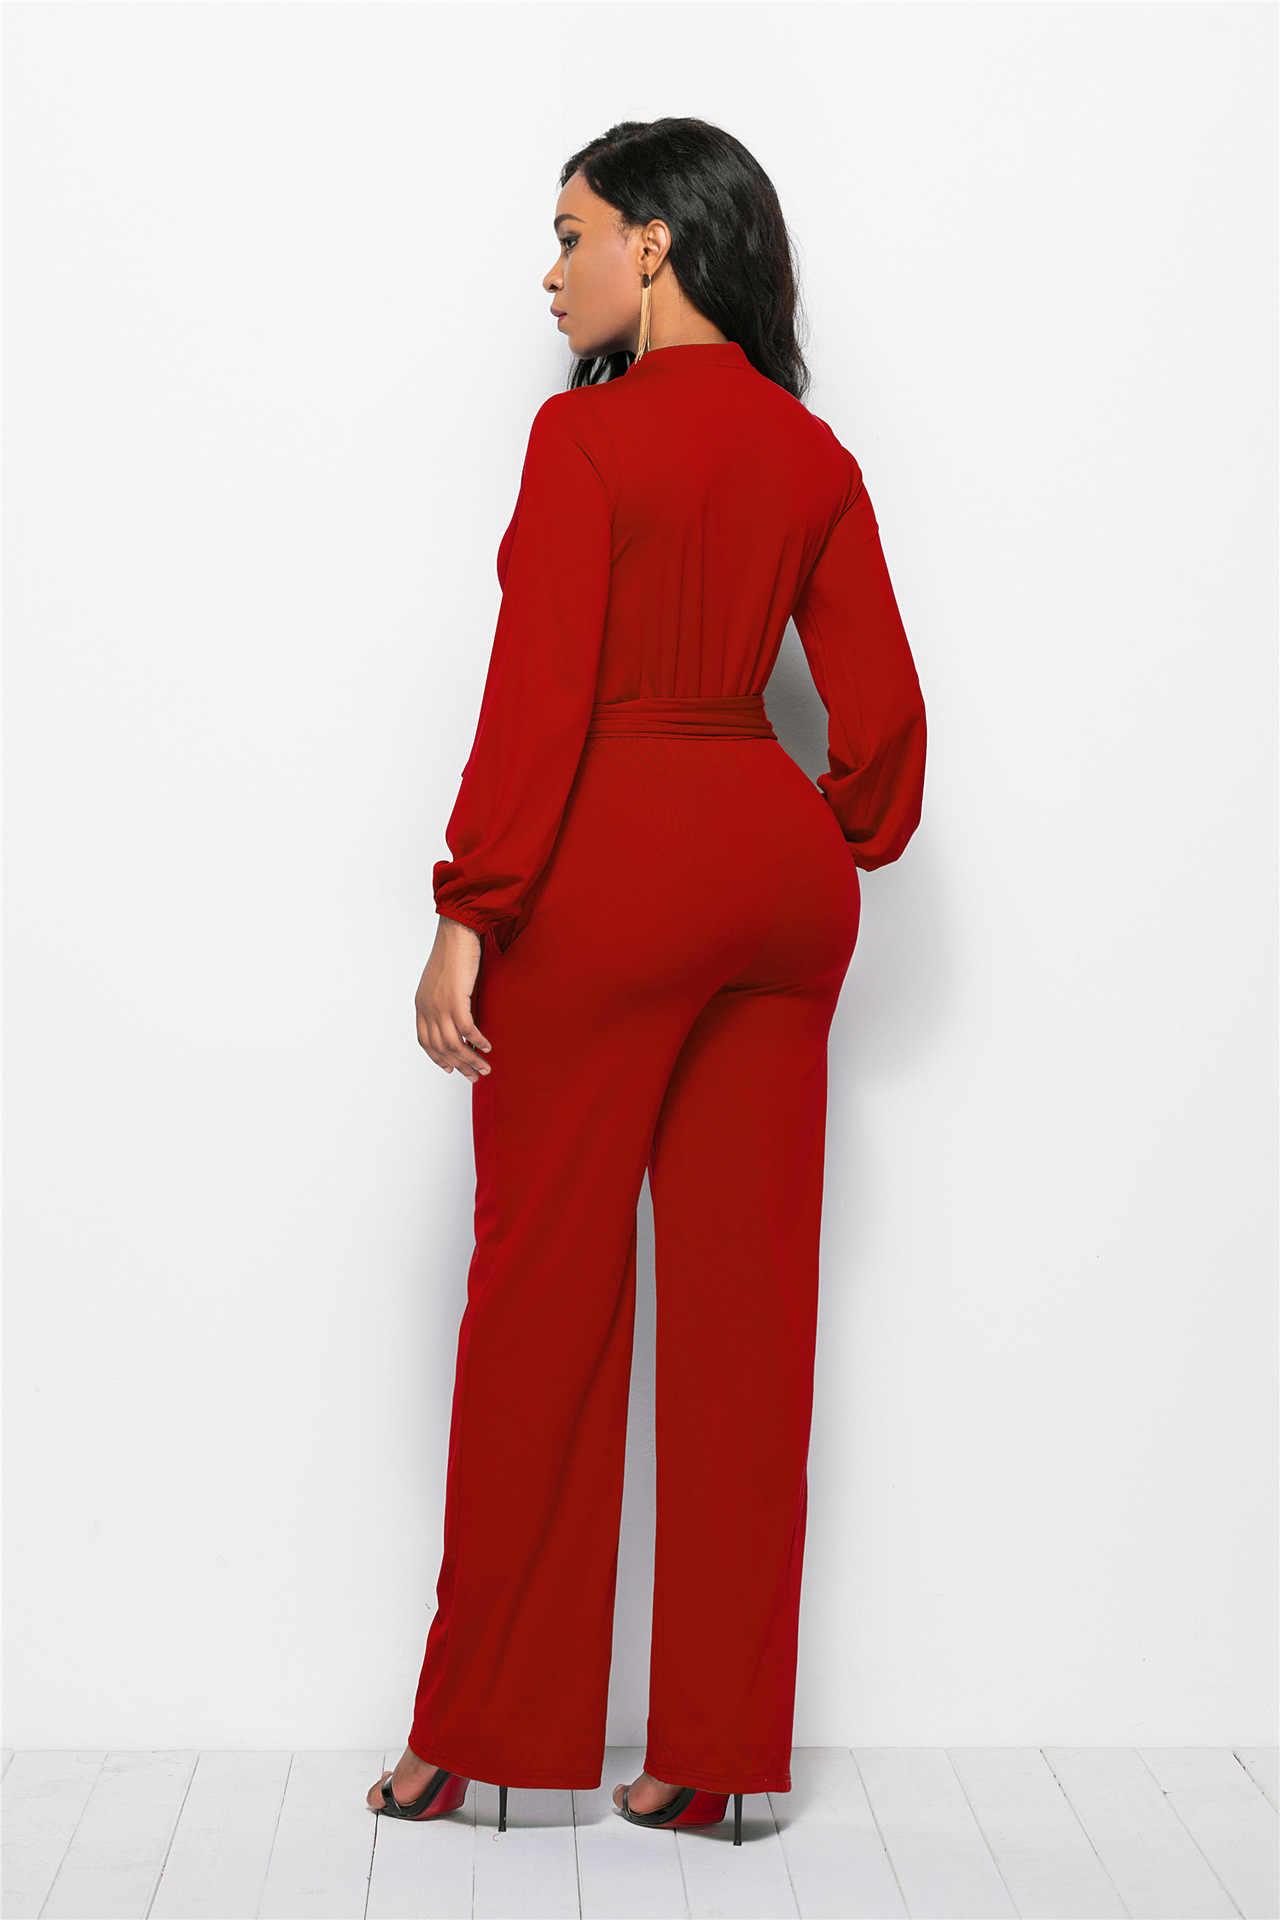 24e98690741e6 3XL Plus Size With Sashes Ladies Summer Long Sleeve Jumpsuits Women Formal  Jumpsuit Elegant Wide Leg Pants Jumpsuit Overalls